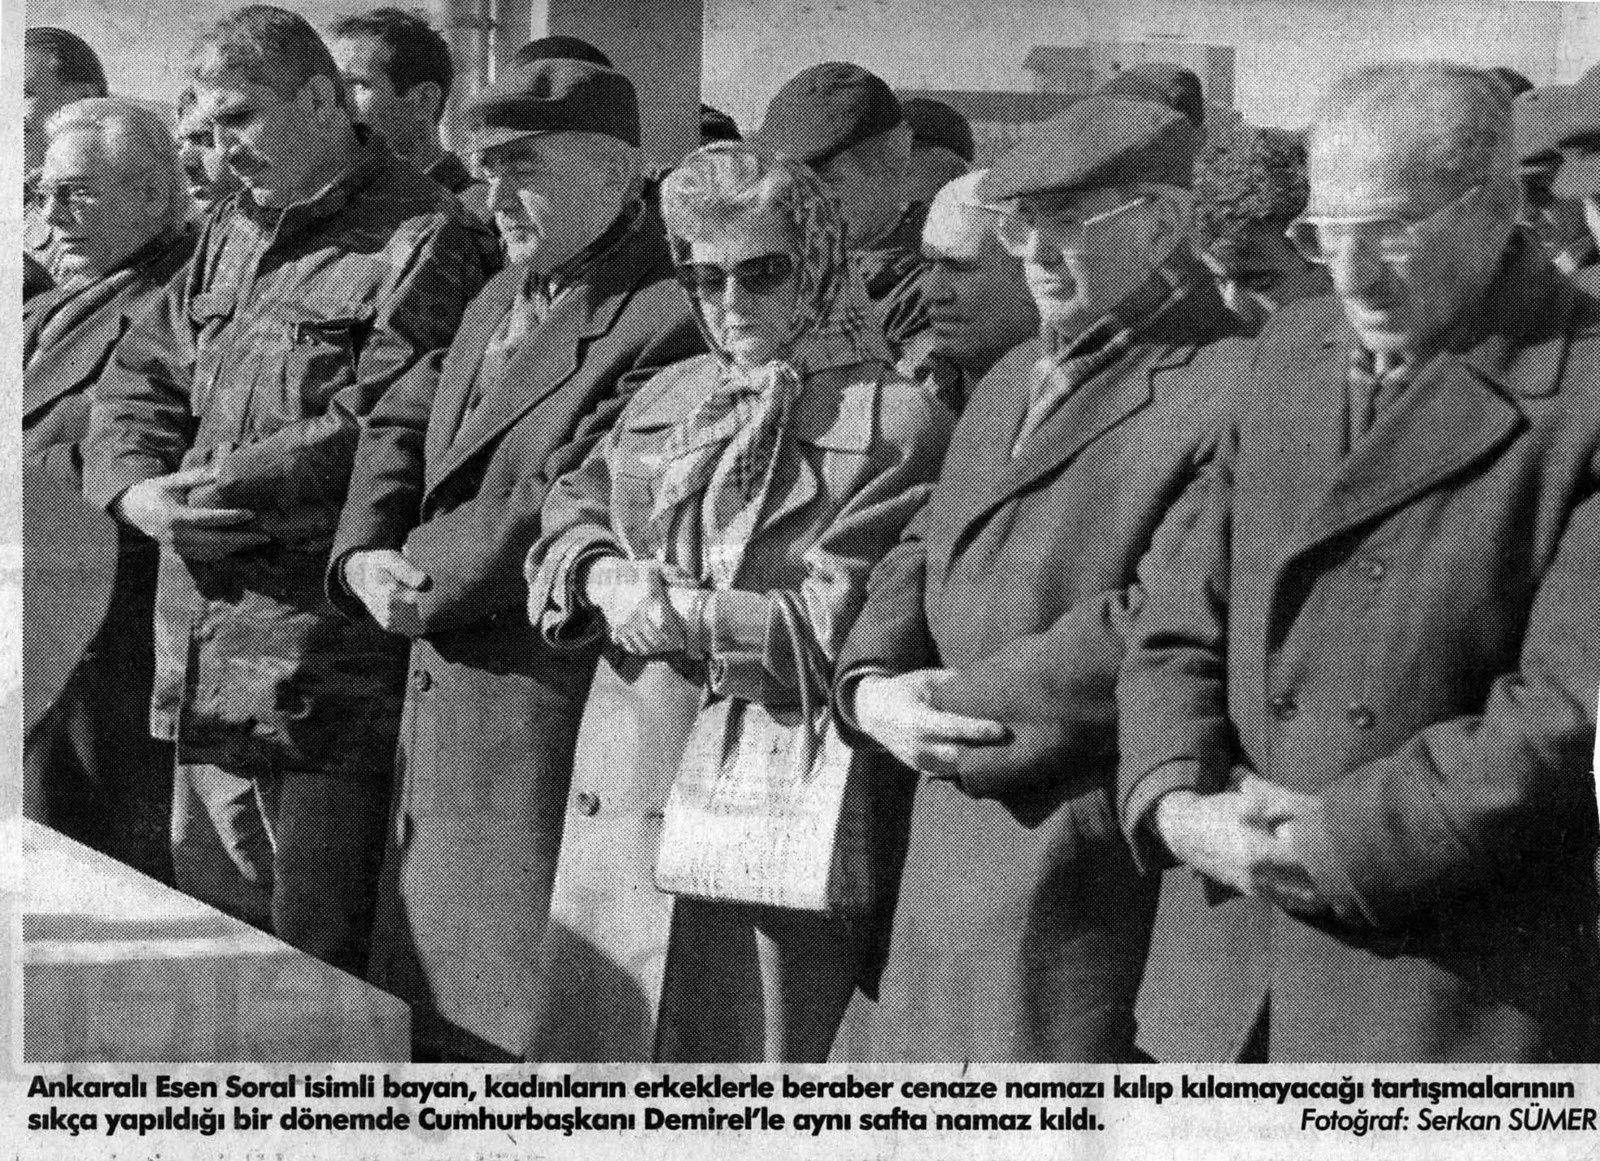 Cliché Serkan Sümer pour Zaman, 10 janvier 1998